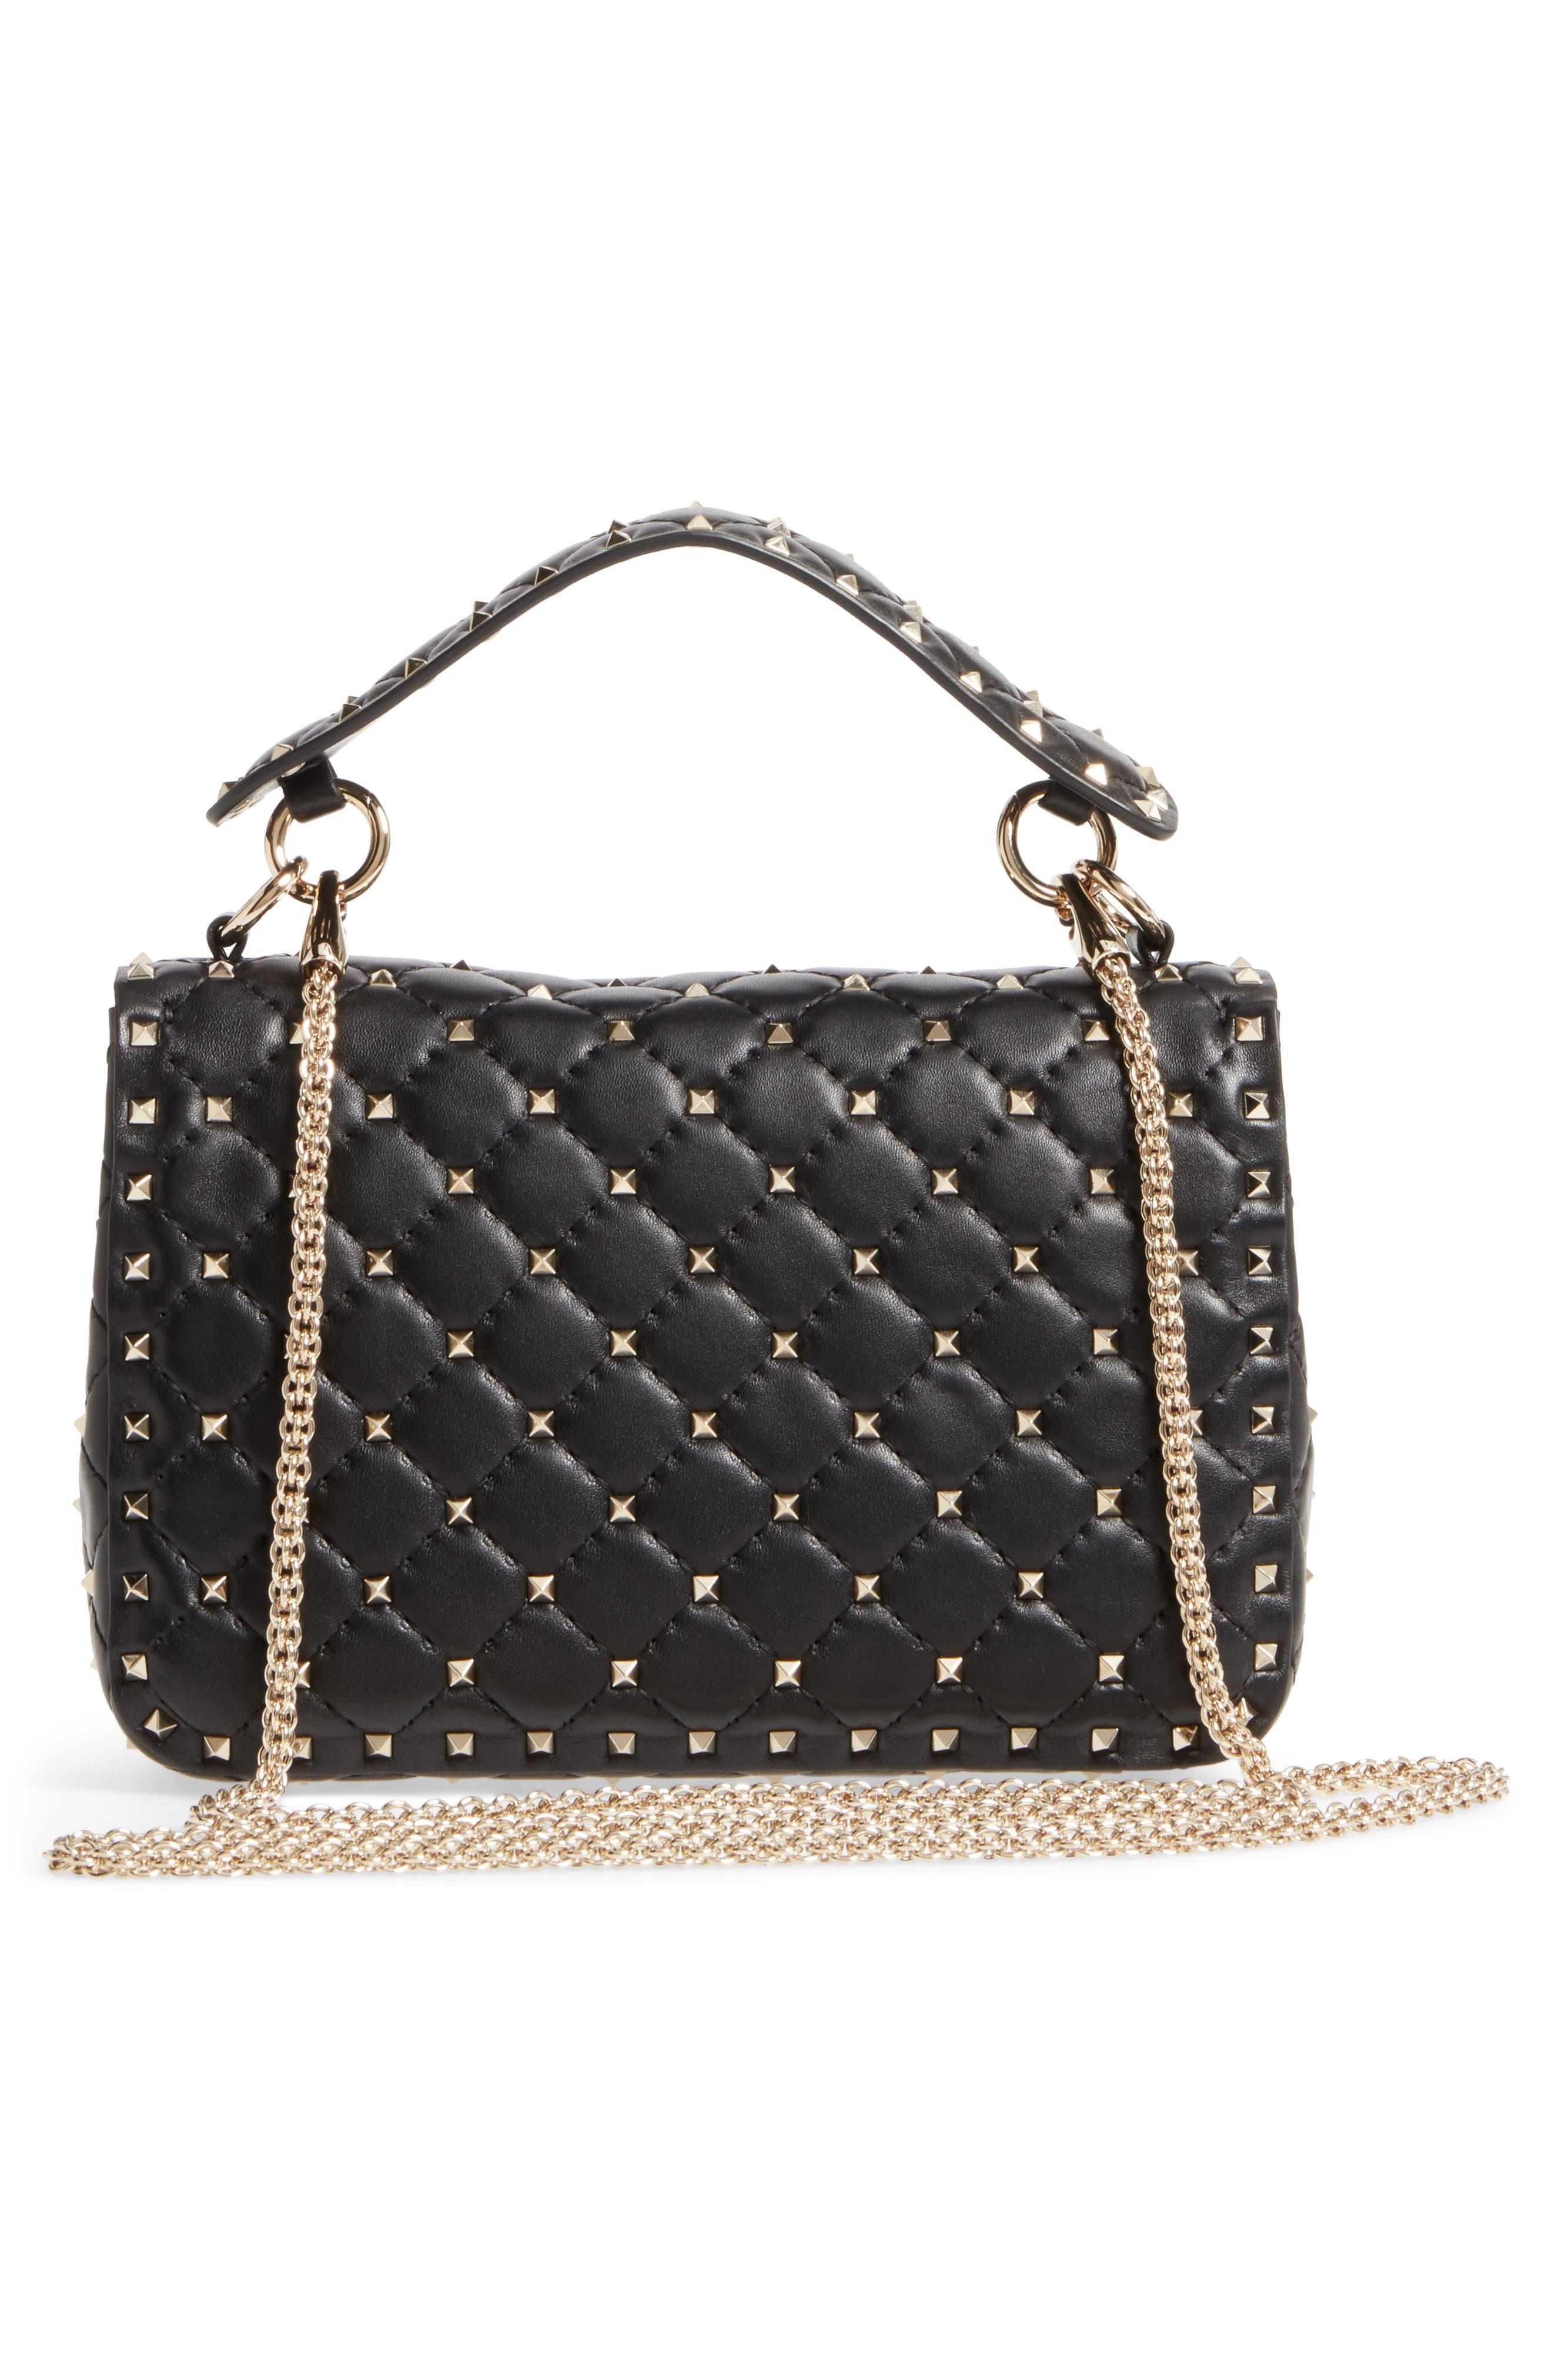 Medium Rockstud Matelassé Quilted Leather Shoulder Bag,                             Alternate thumbnail 3, color,                             BLACK